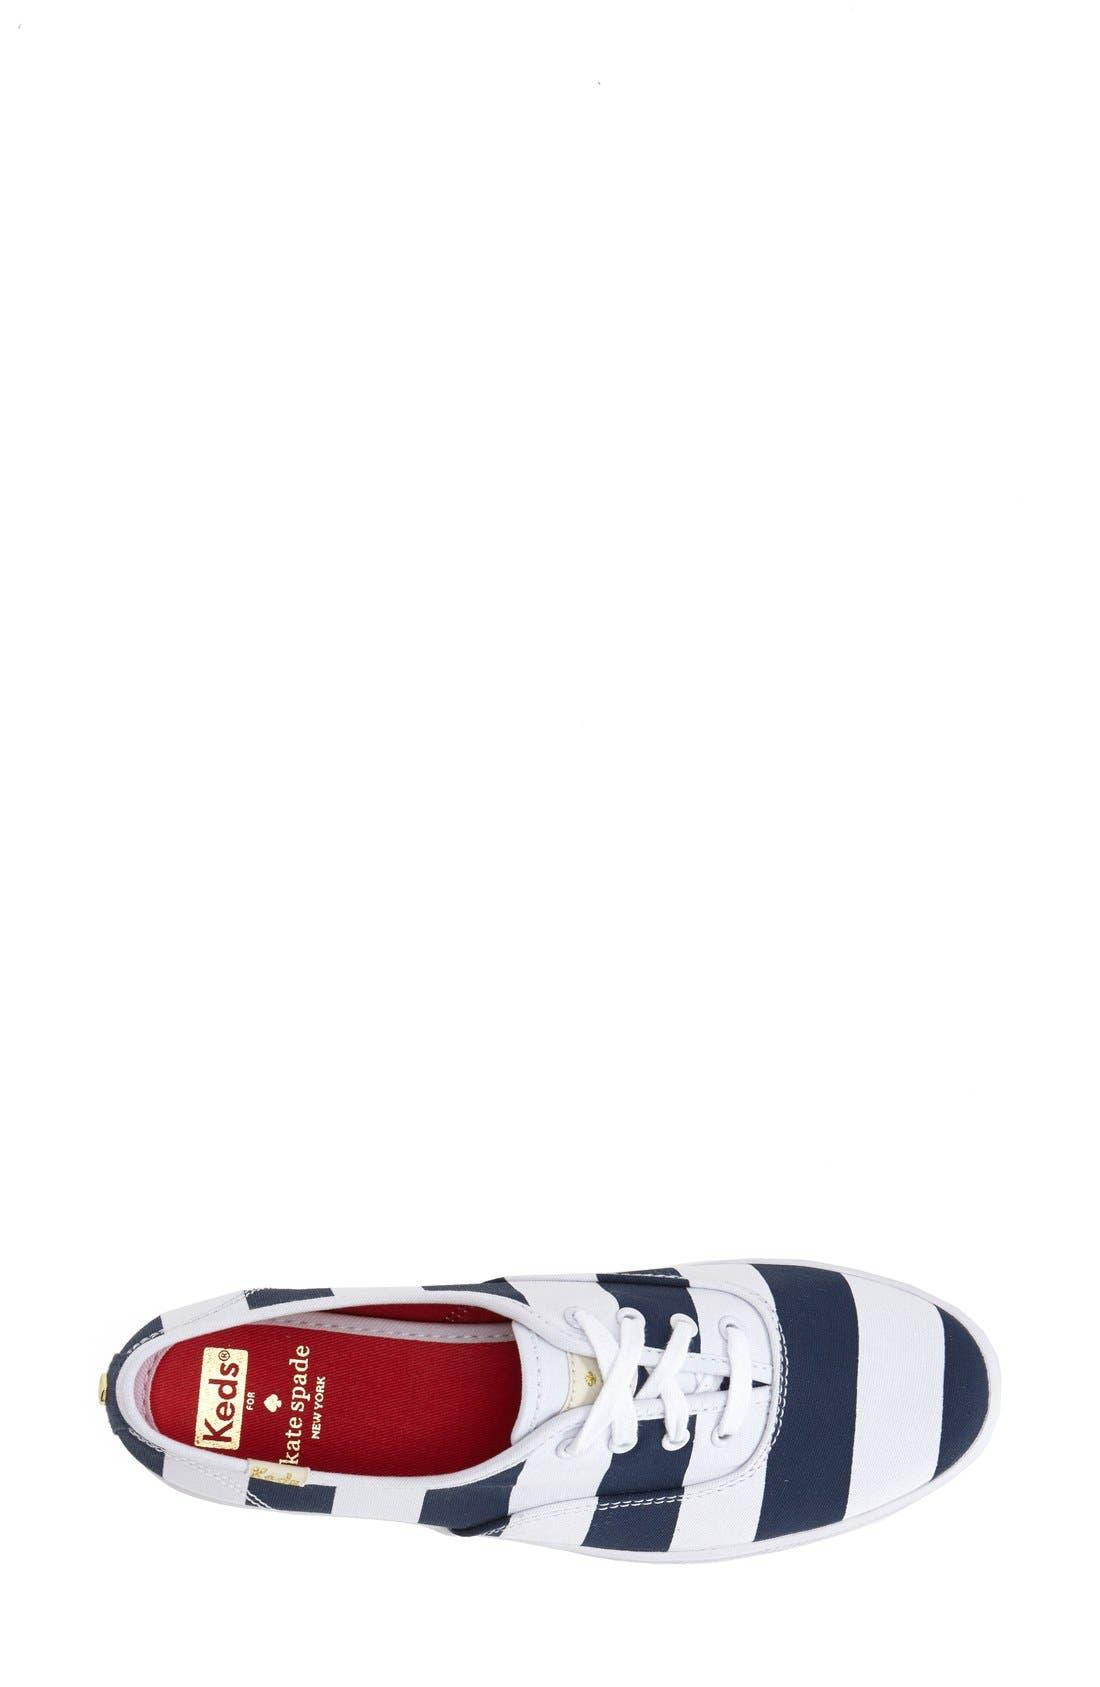 Alternate Image 3  - Keds® for kate spade new york 'triple kick' sneaker (Women)